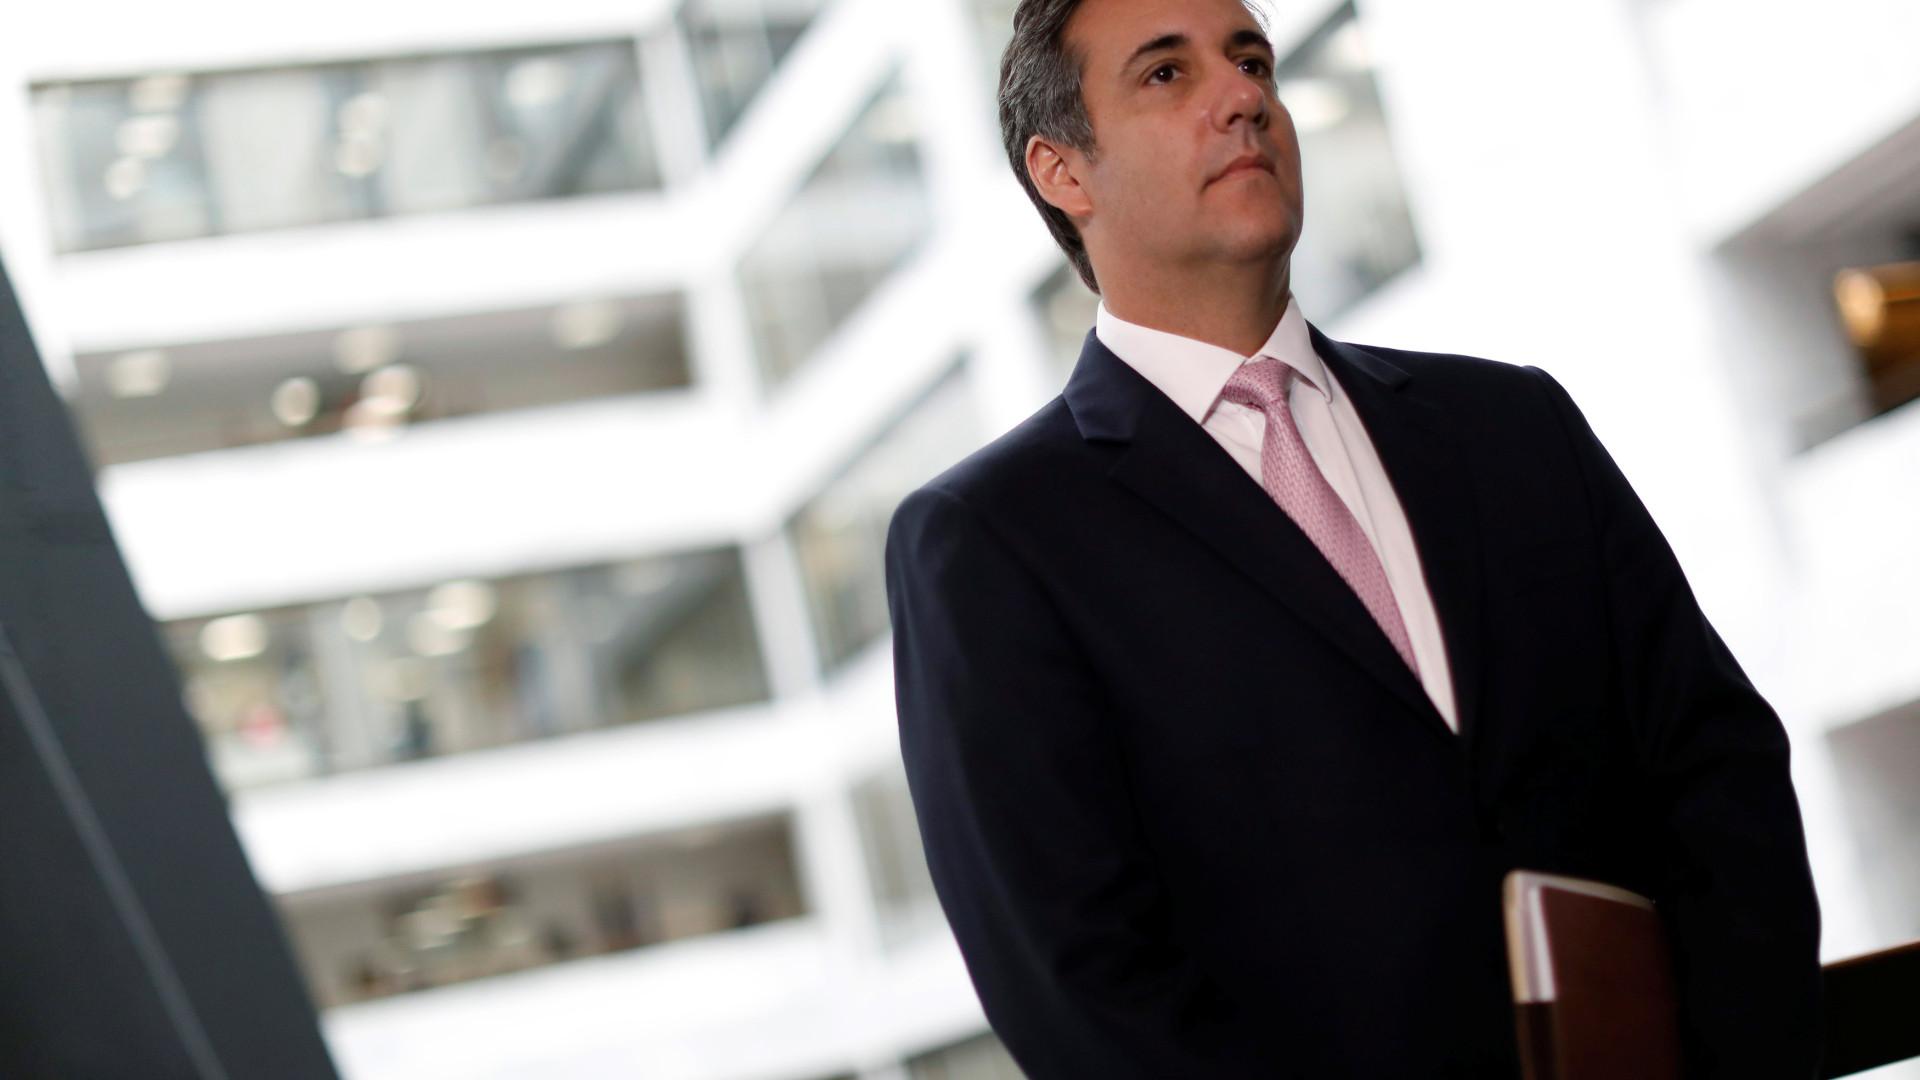 Tribunal rejeita pedido para impedir análise aos documentos de Cohen